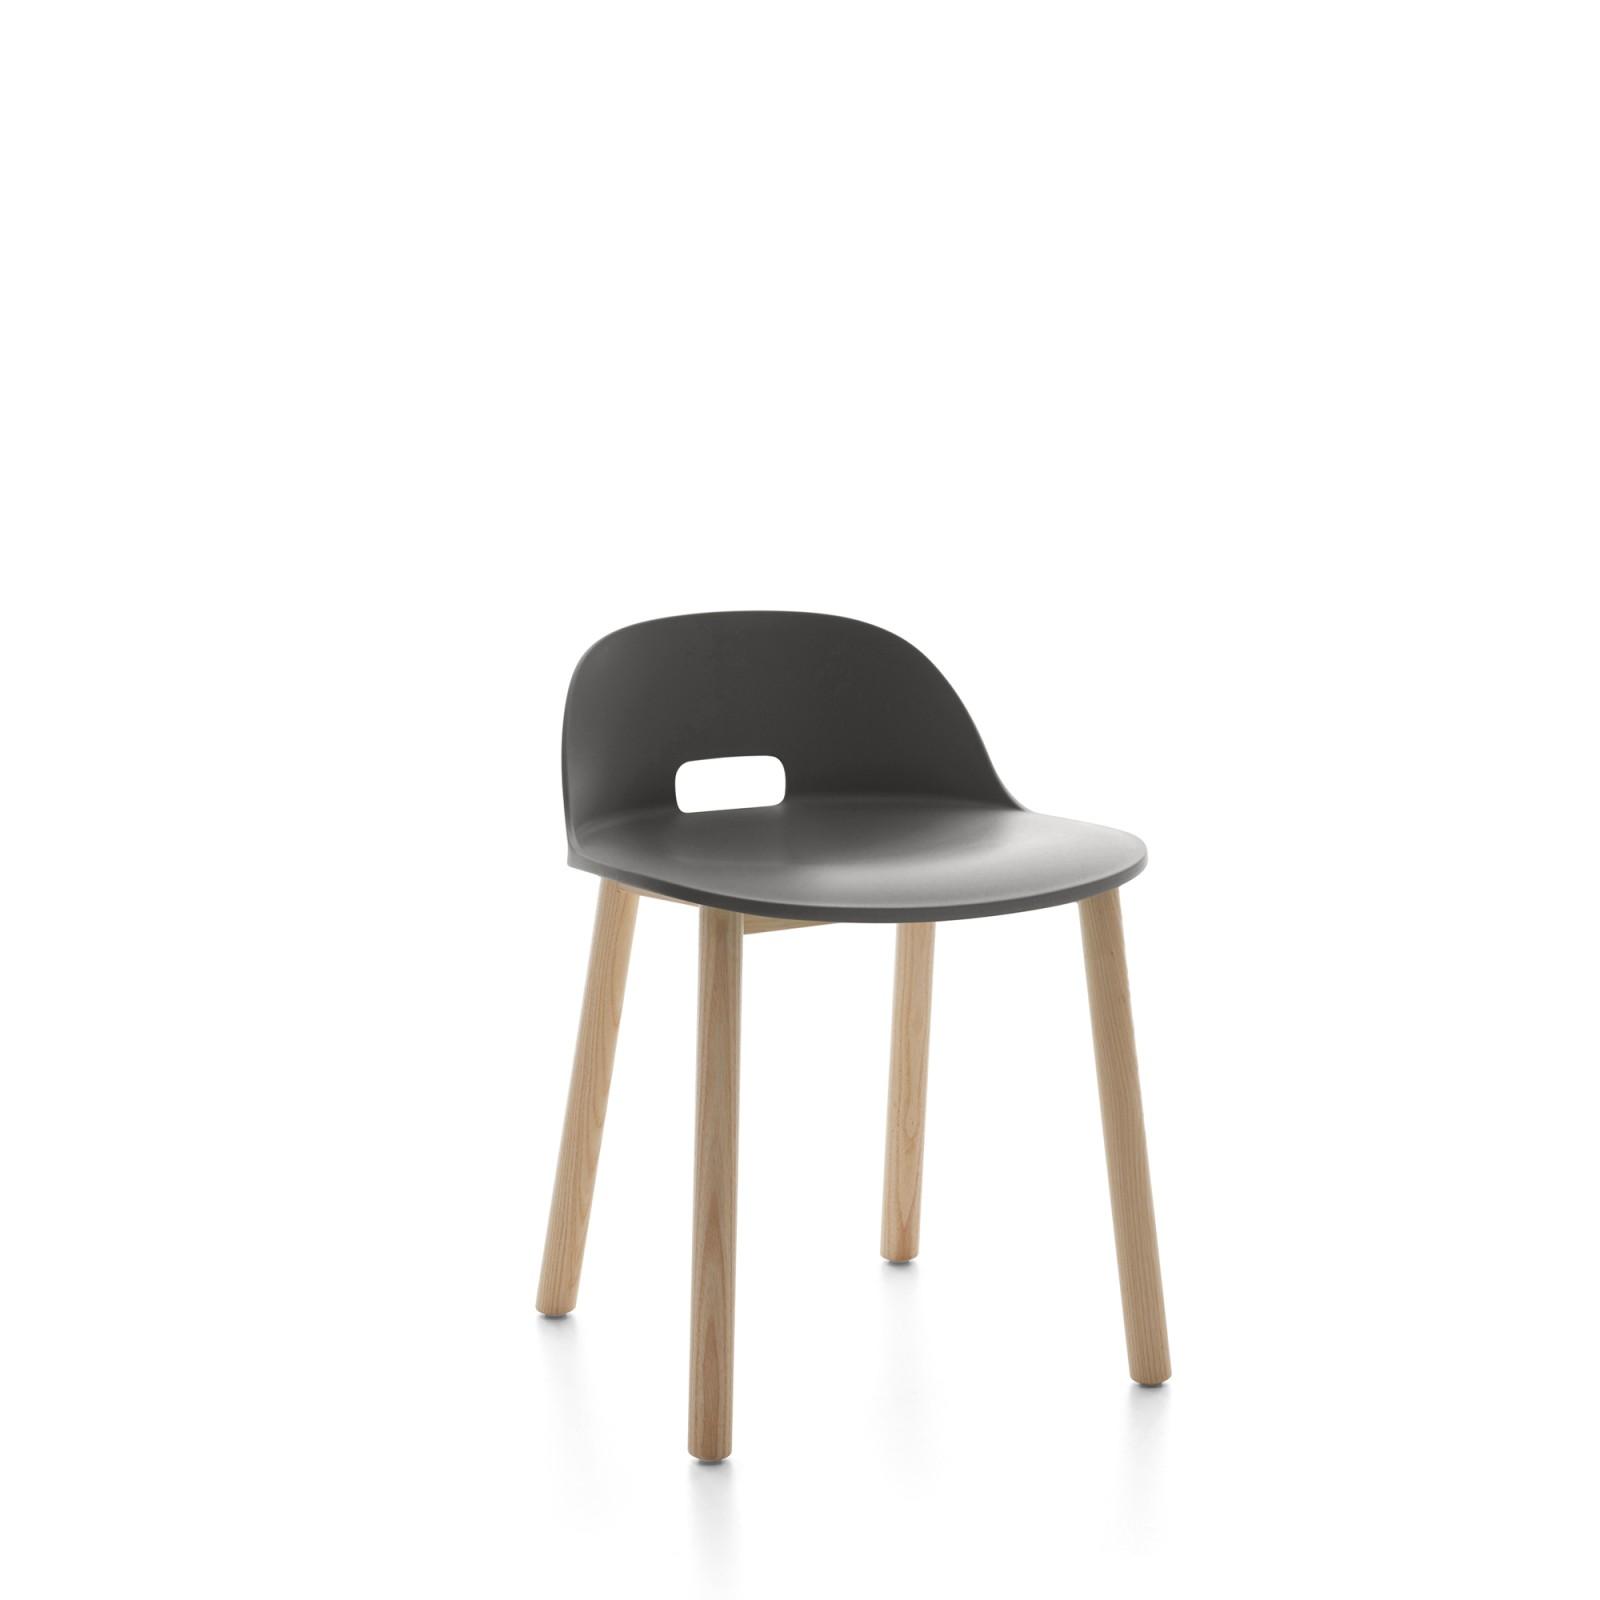 Alfi Chair, Low Back Dark Grey, Natural Light Ash Frame